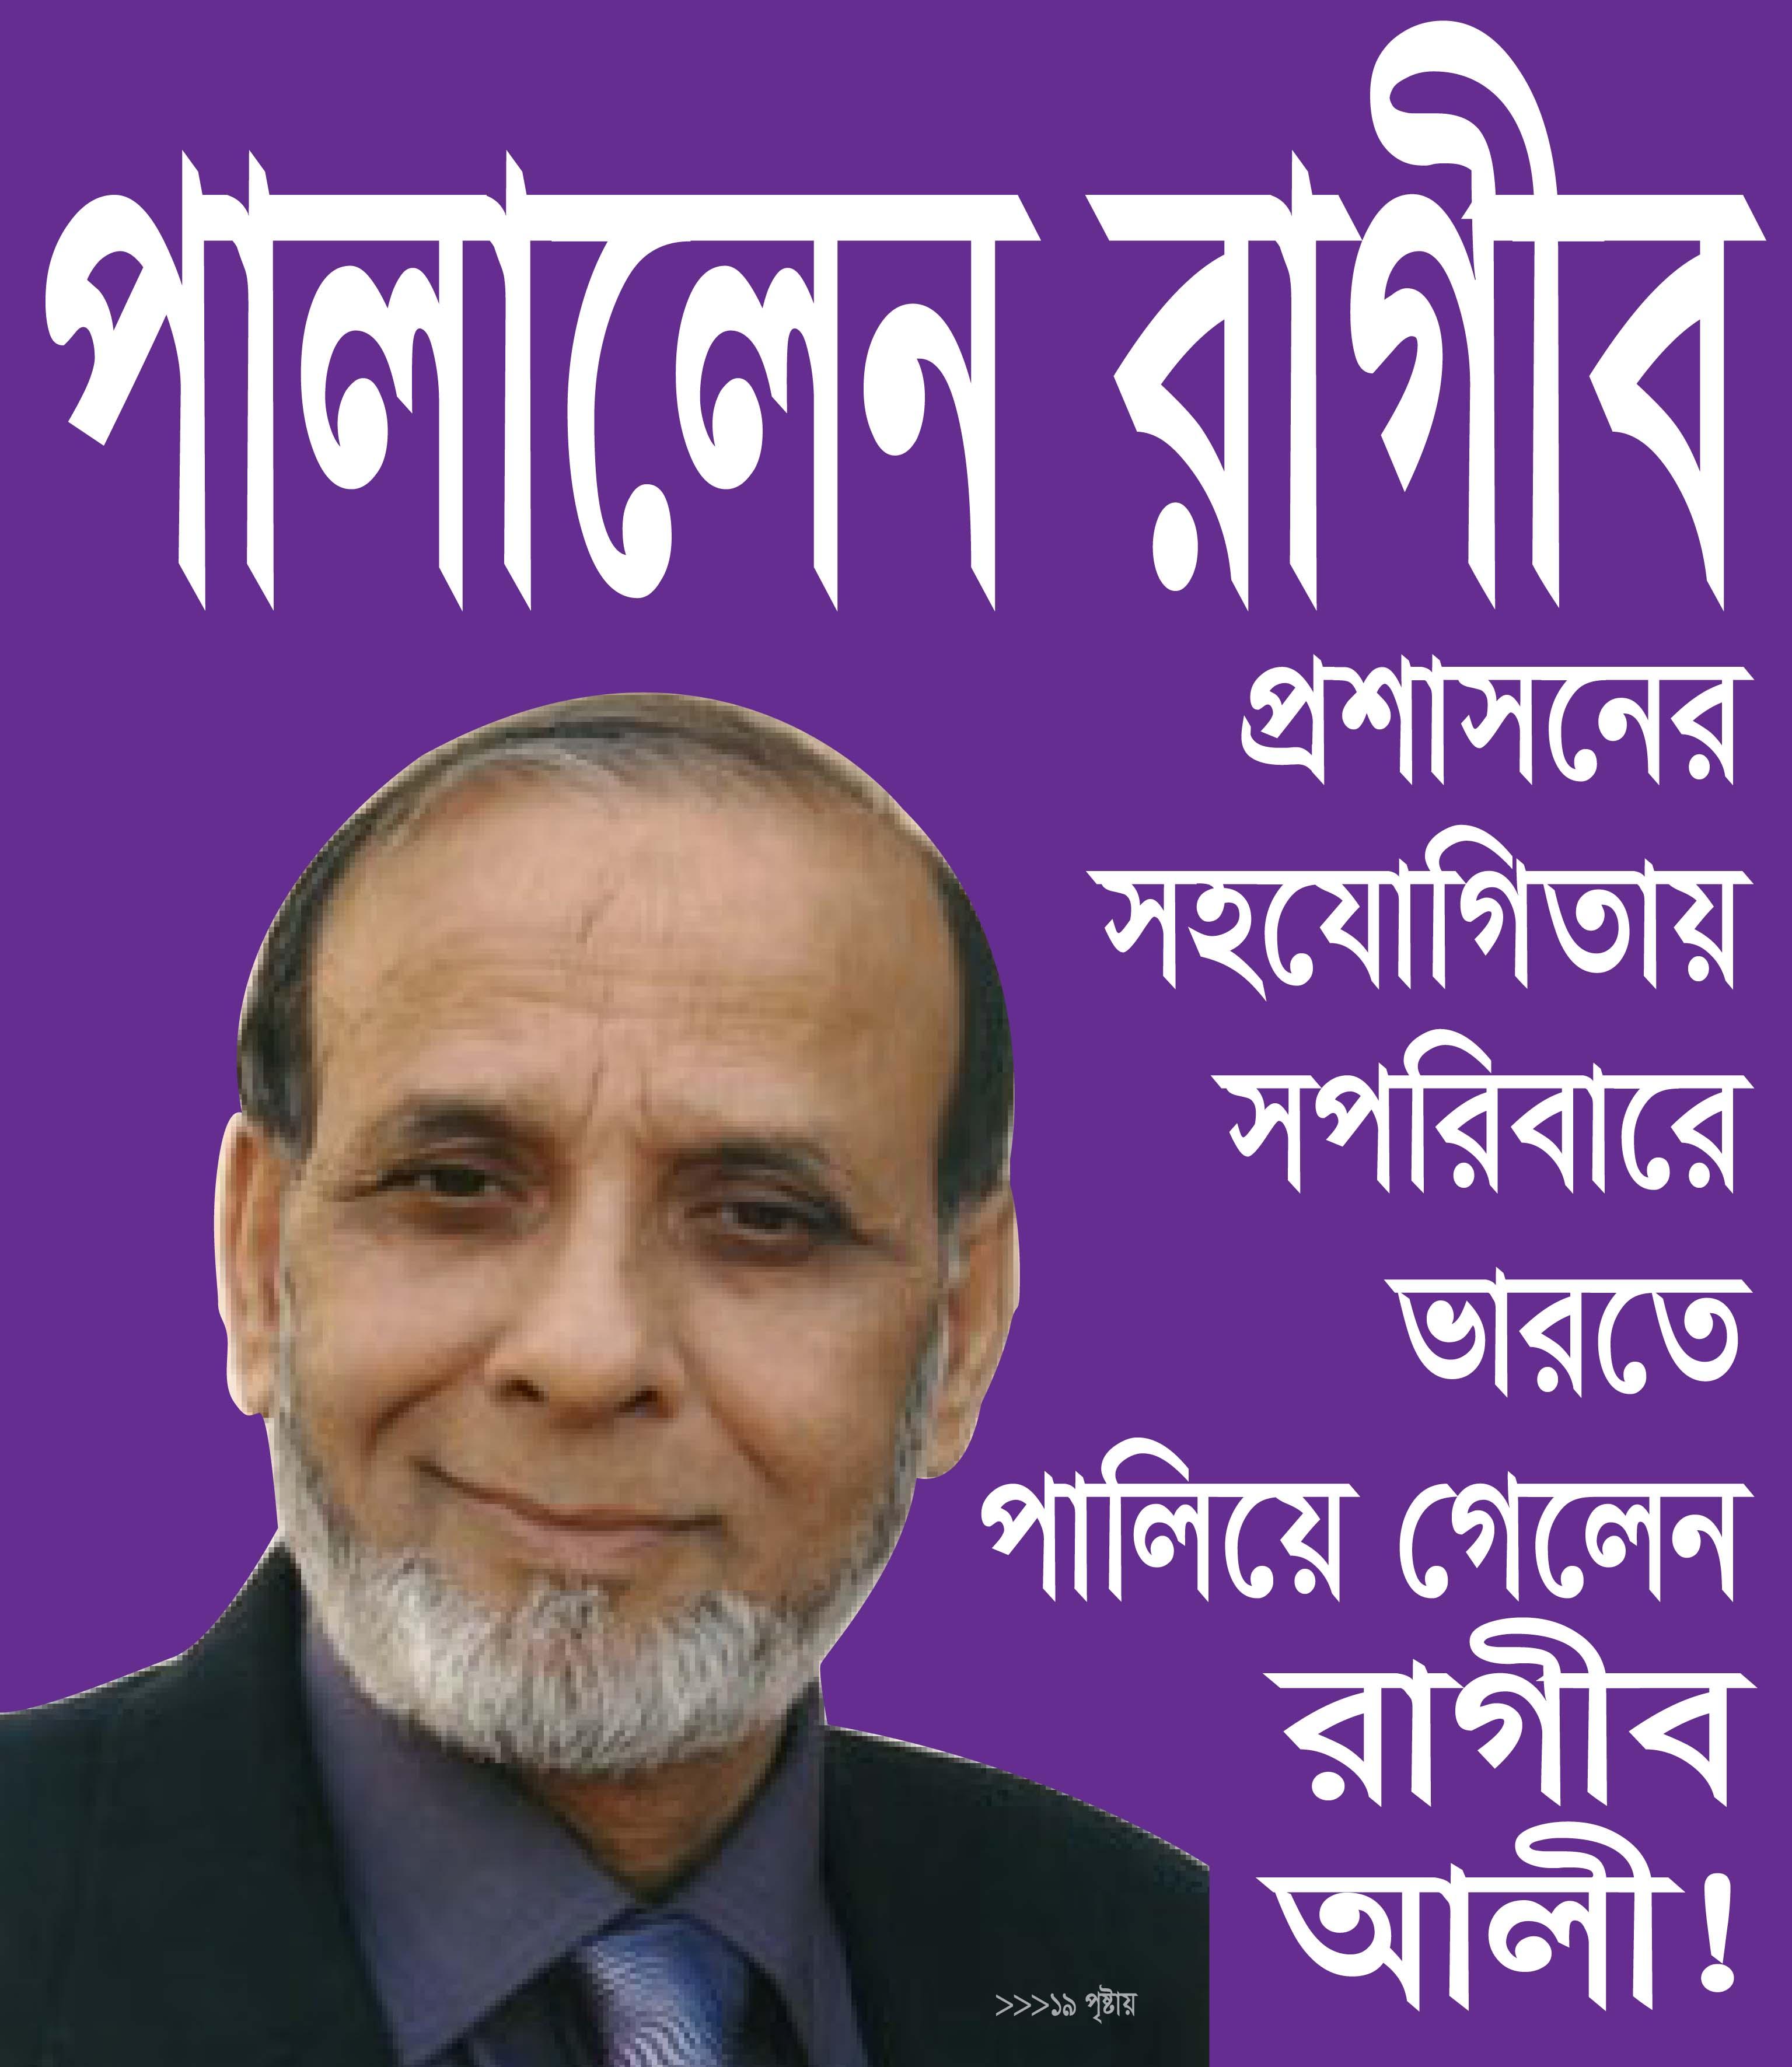 Bangla Sanglap